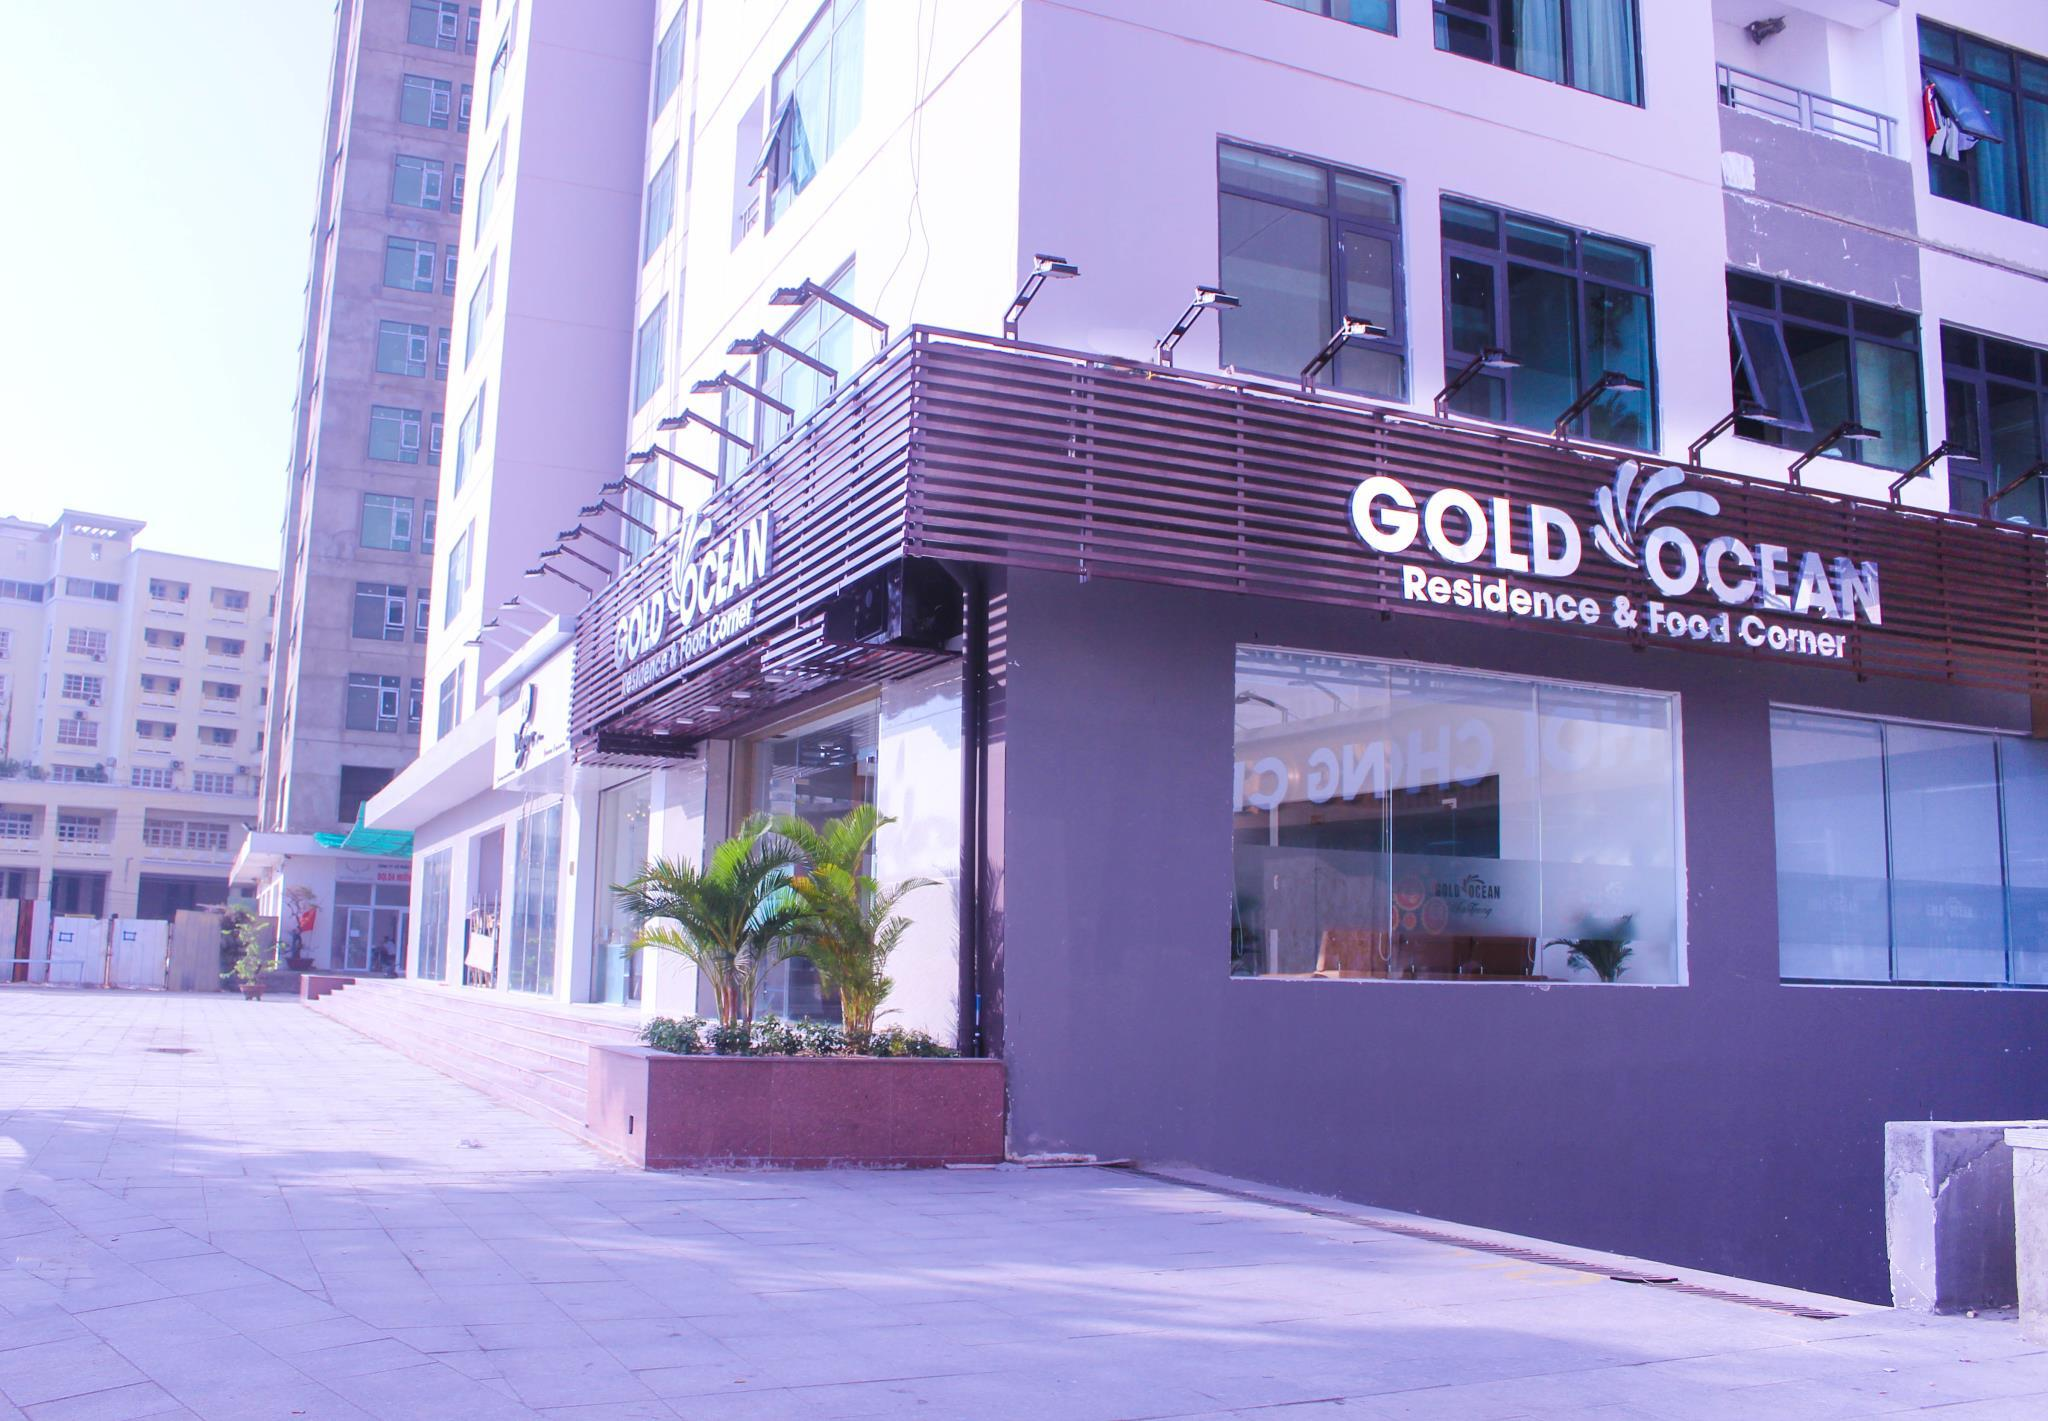 Gold Oceanus Nha Trang Hotel And Apartment